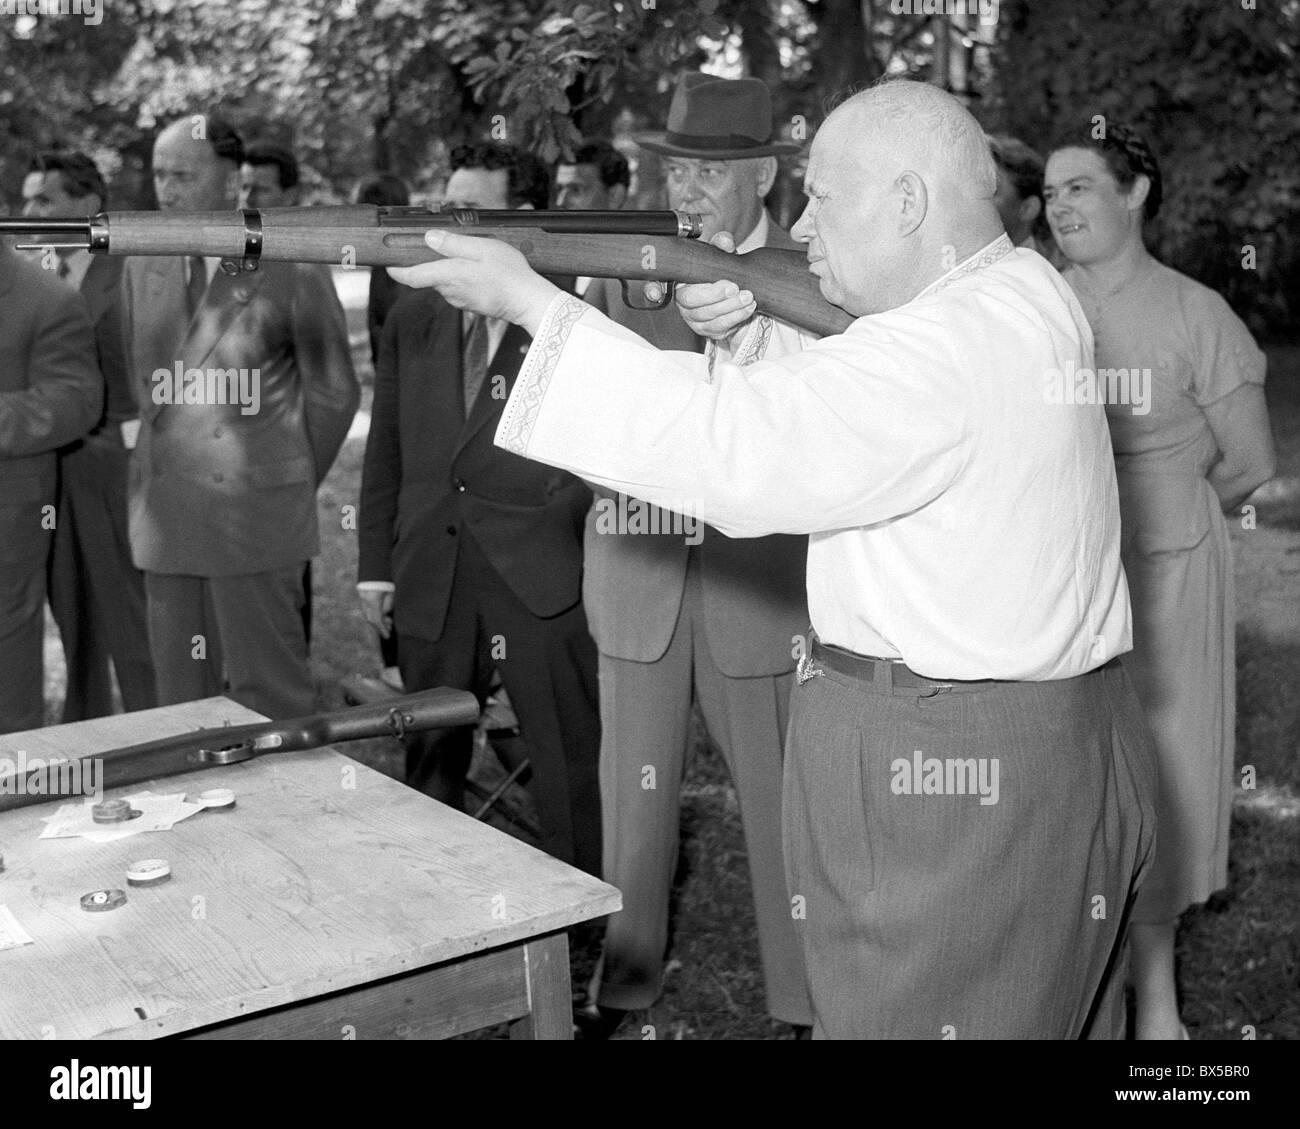 Nikita Khrushchev, air rifle, shirt, shooting - Stock Image